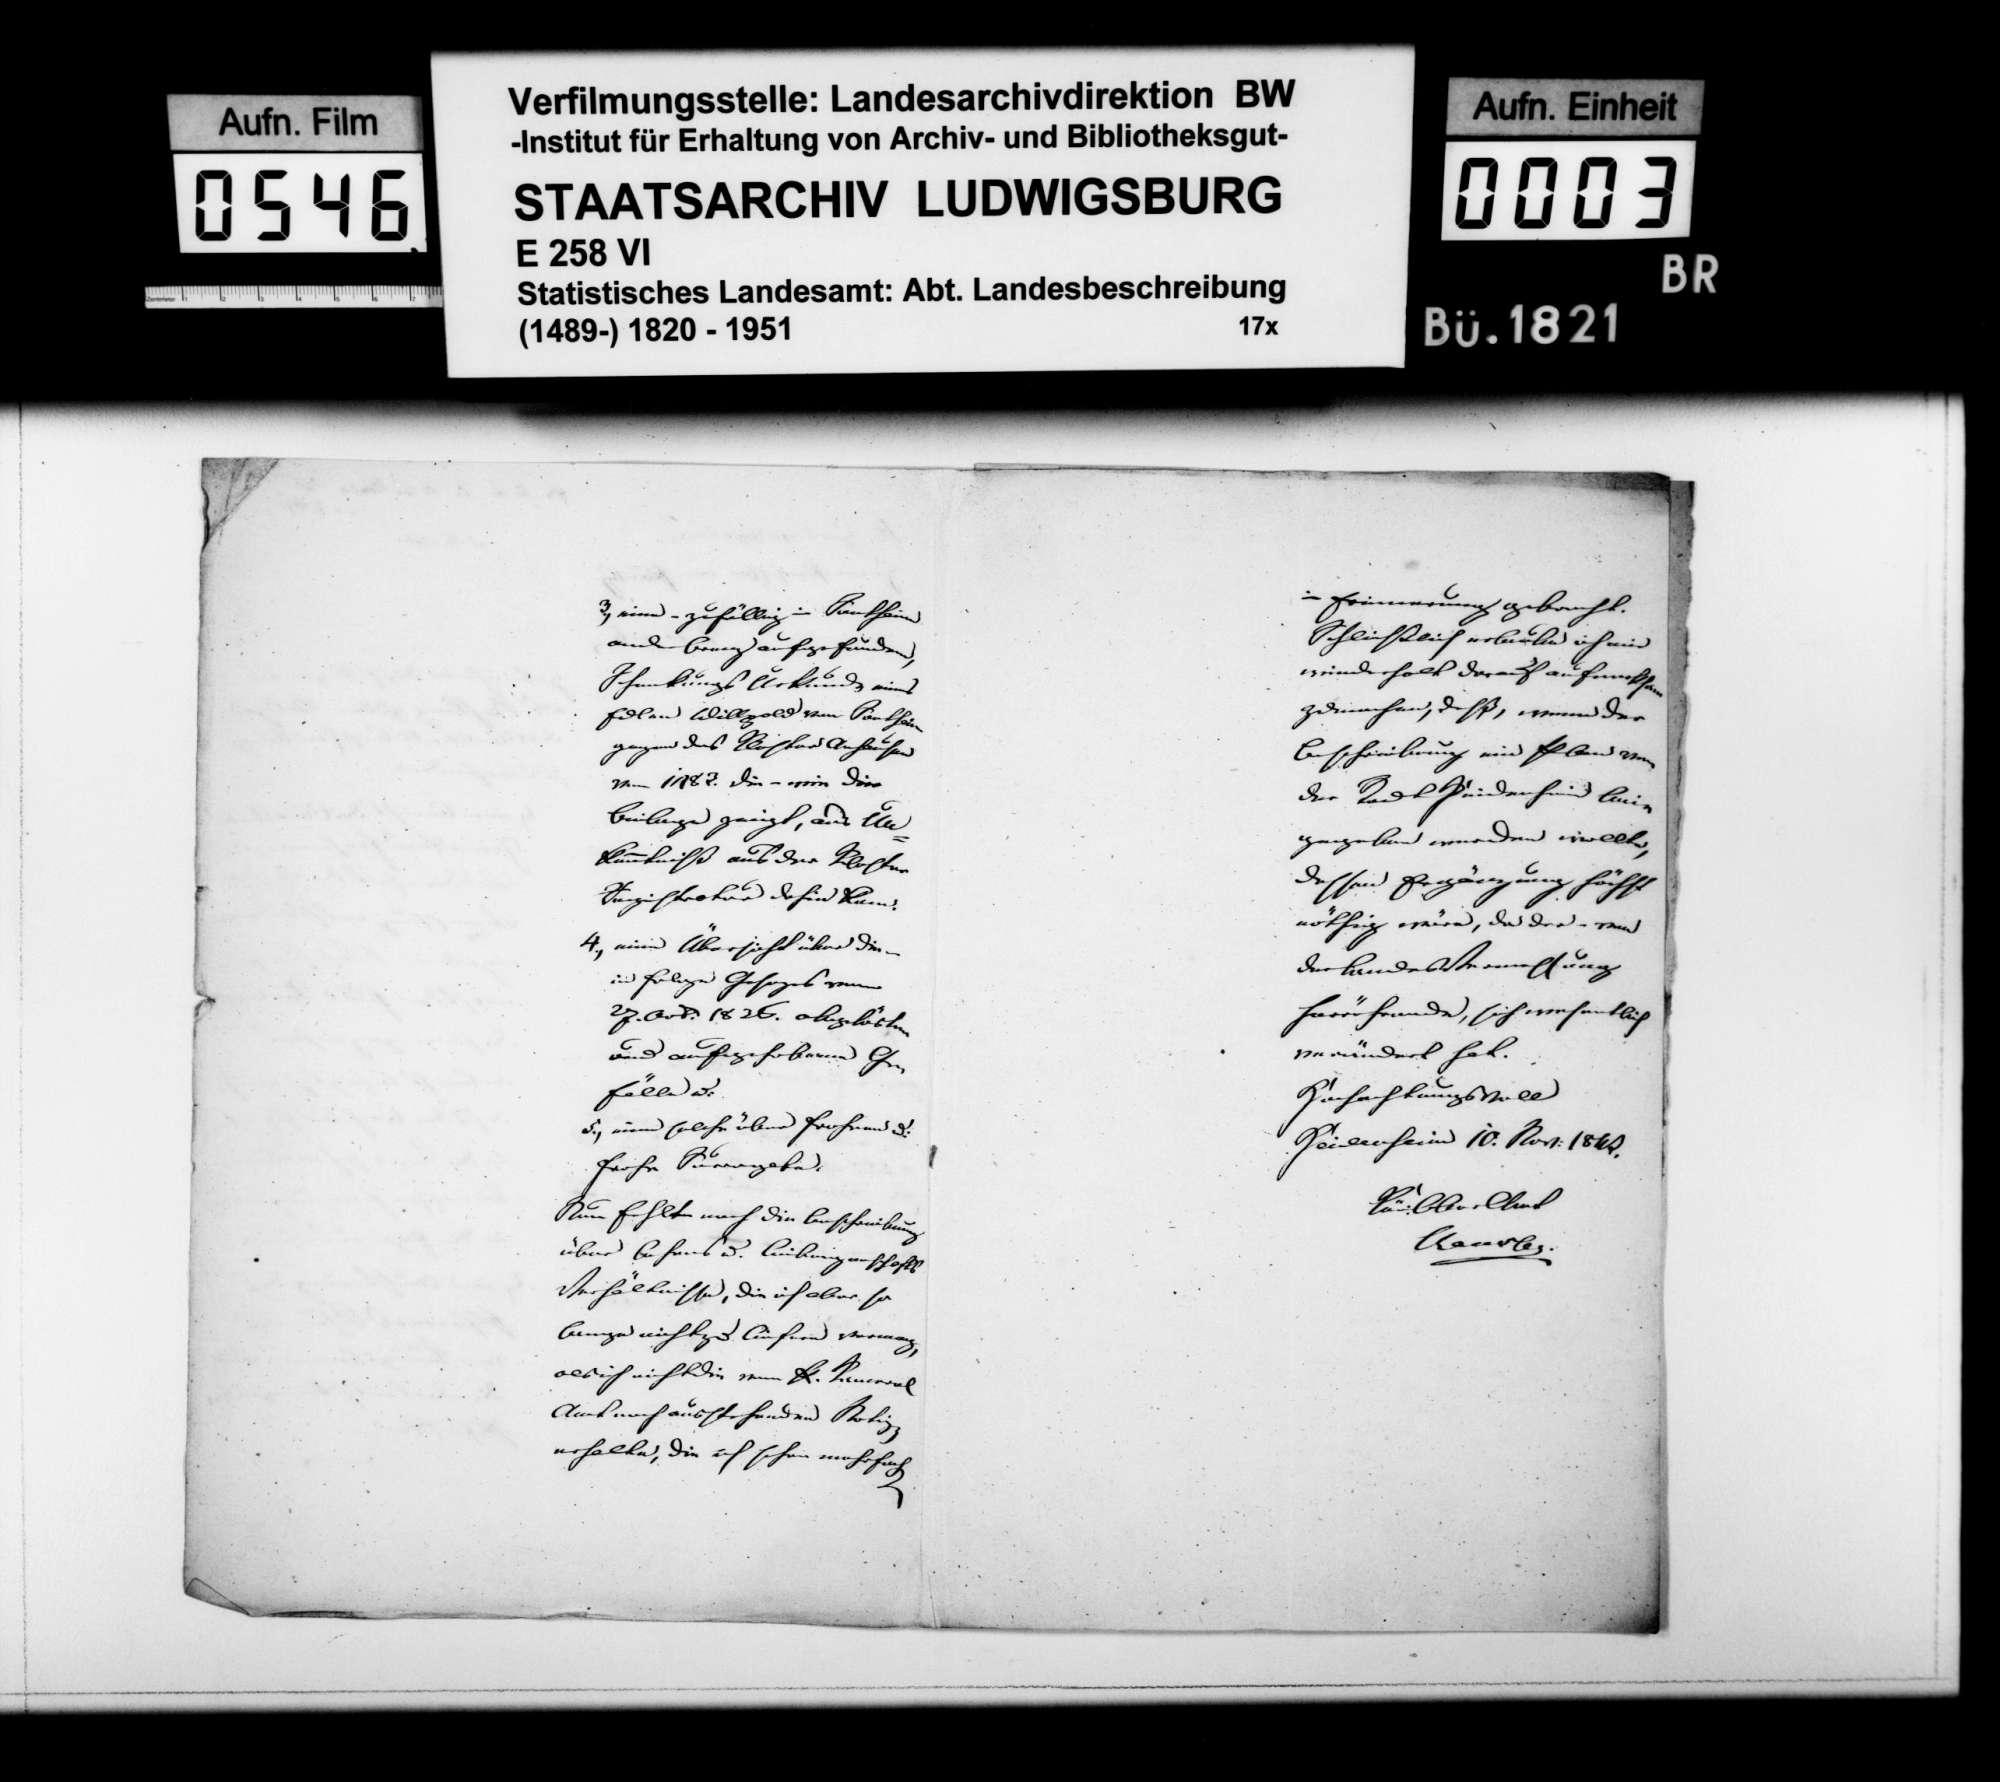 Abhandlung des Pfarrers Schumann aus Königsbronn über den Ursprung des Flüßchens Pfeffer, Bild 2